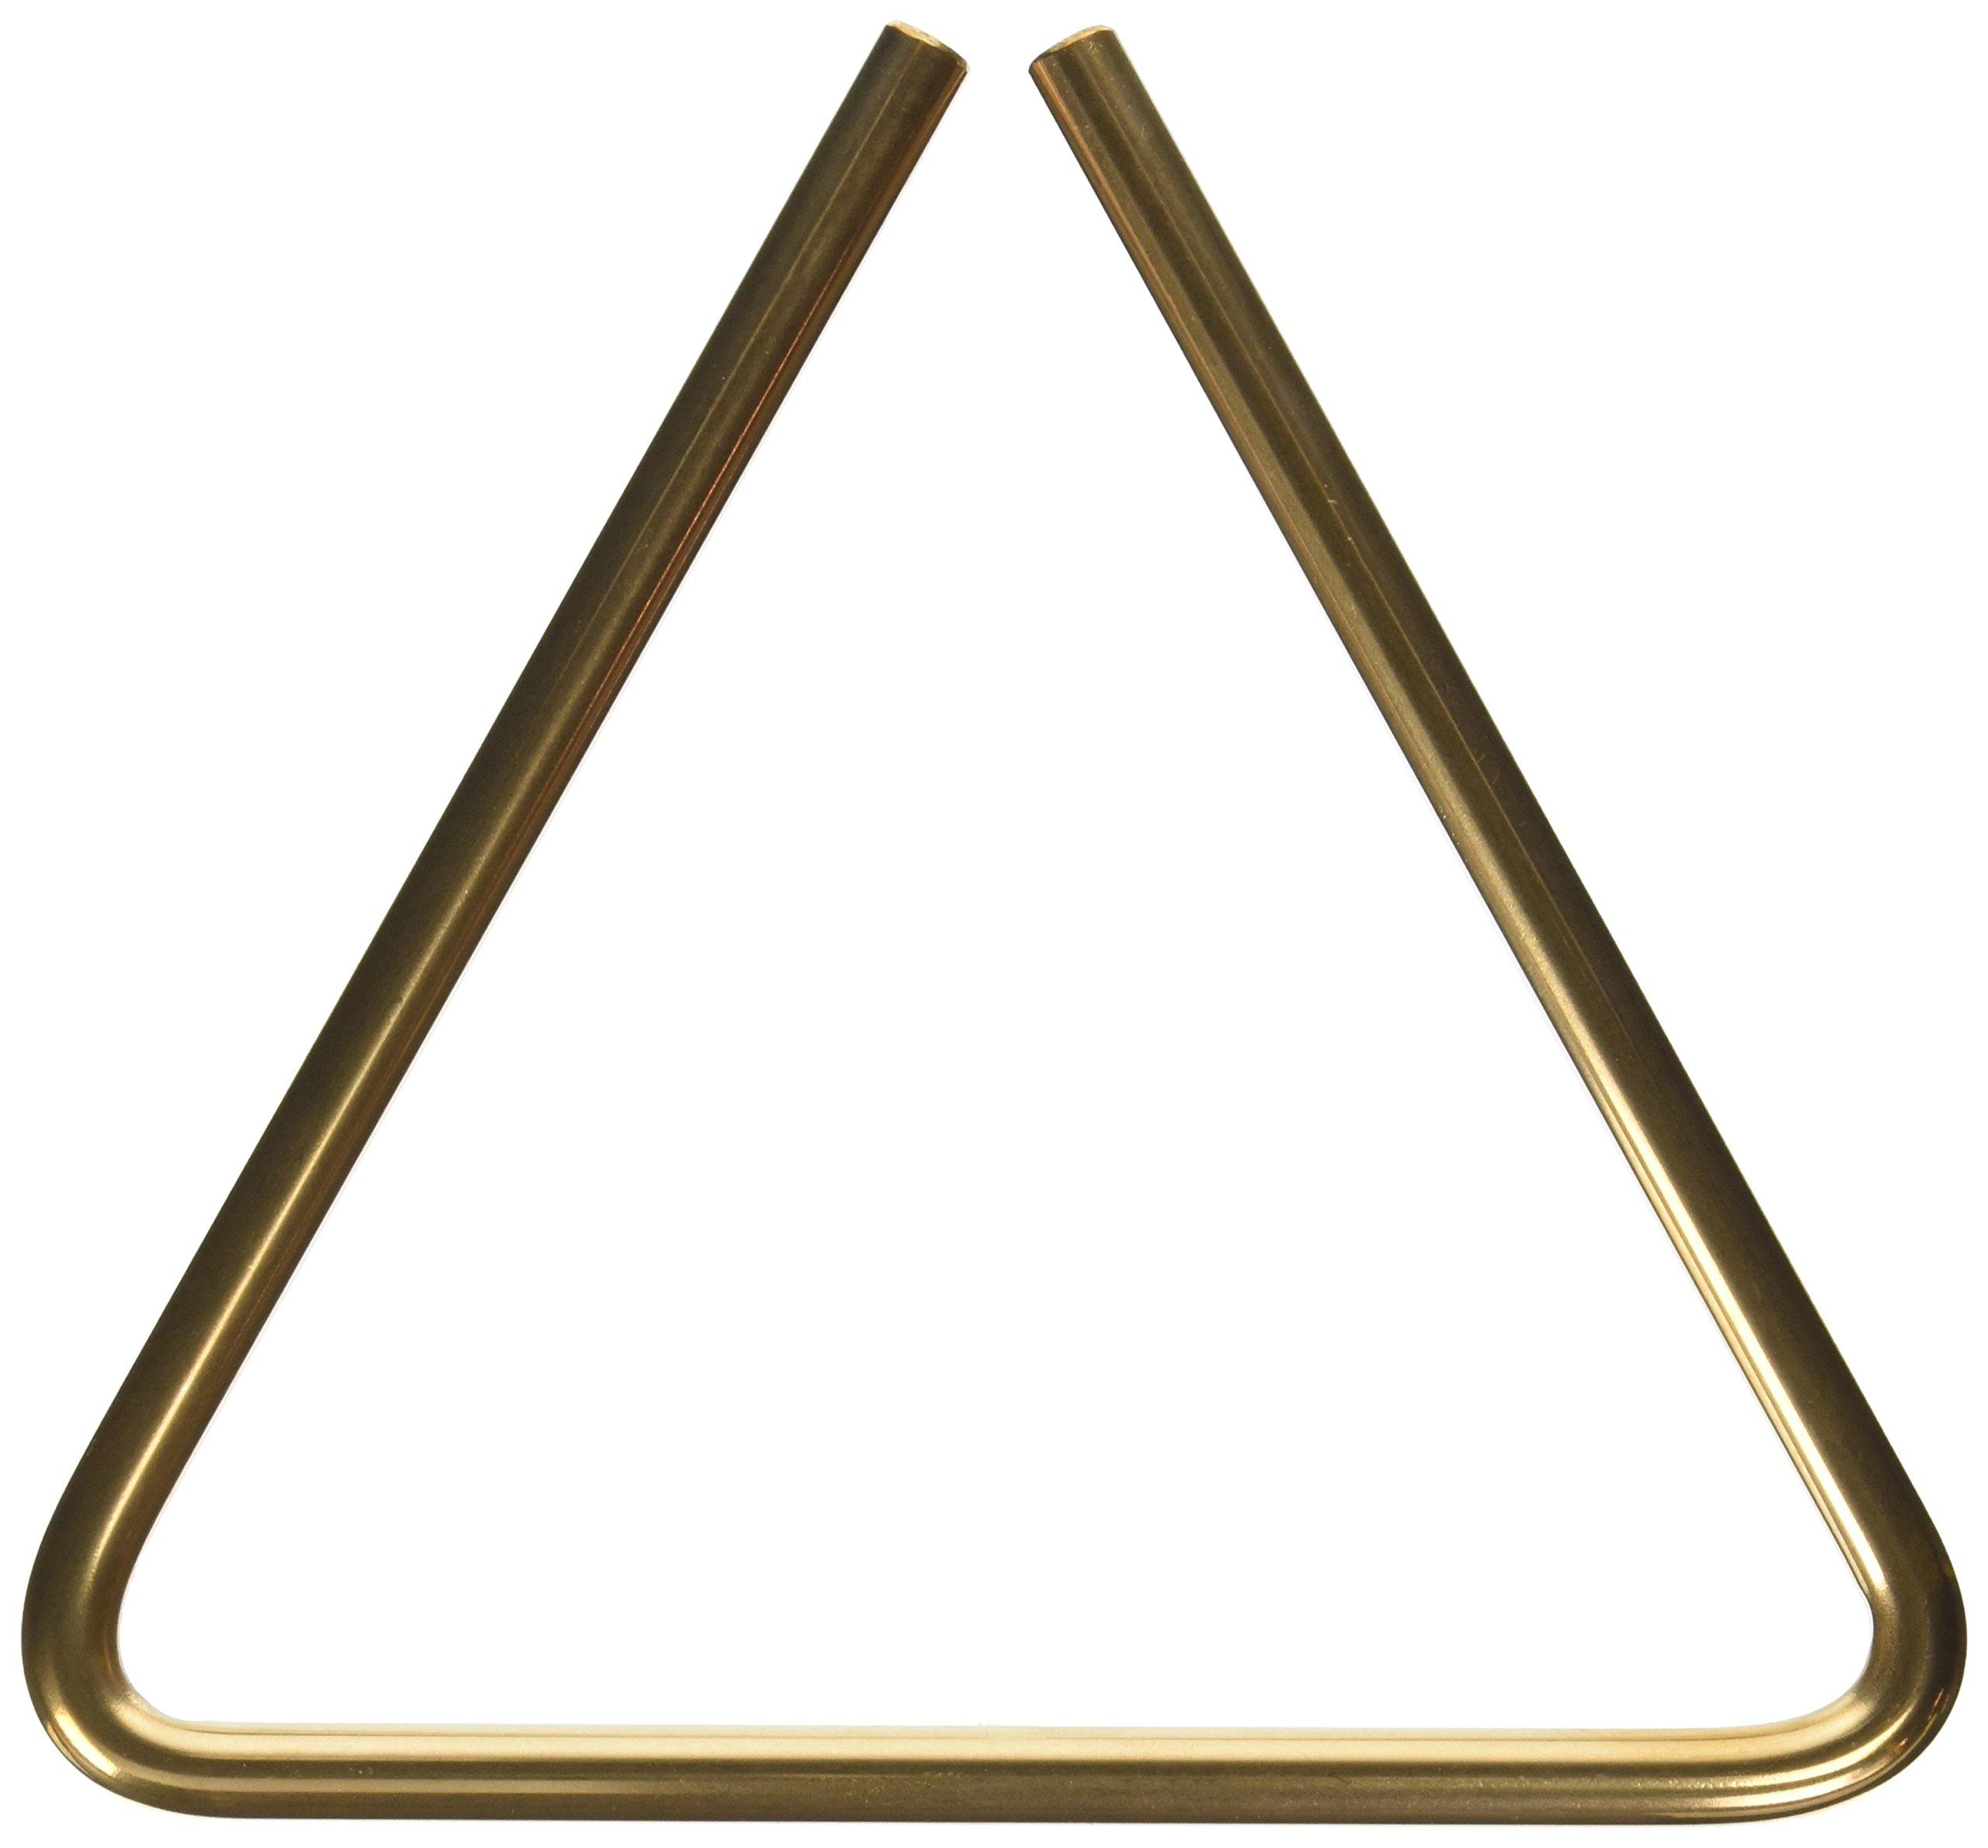 Sabian B8 Bronze Triangle, 7-inch by Sabian